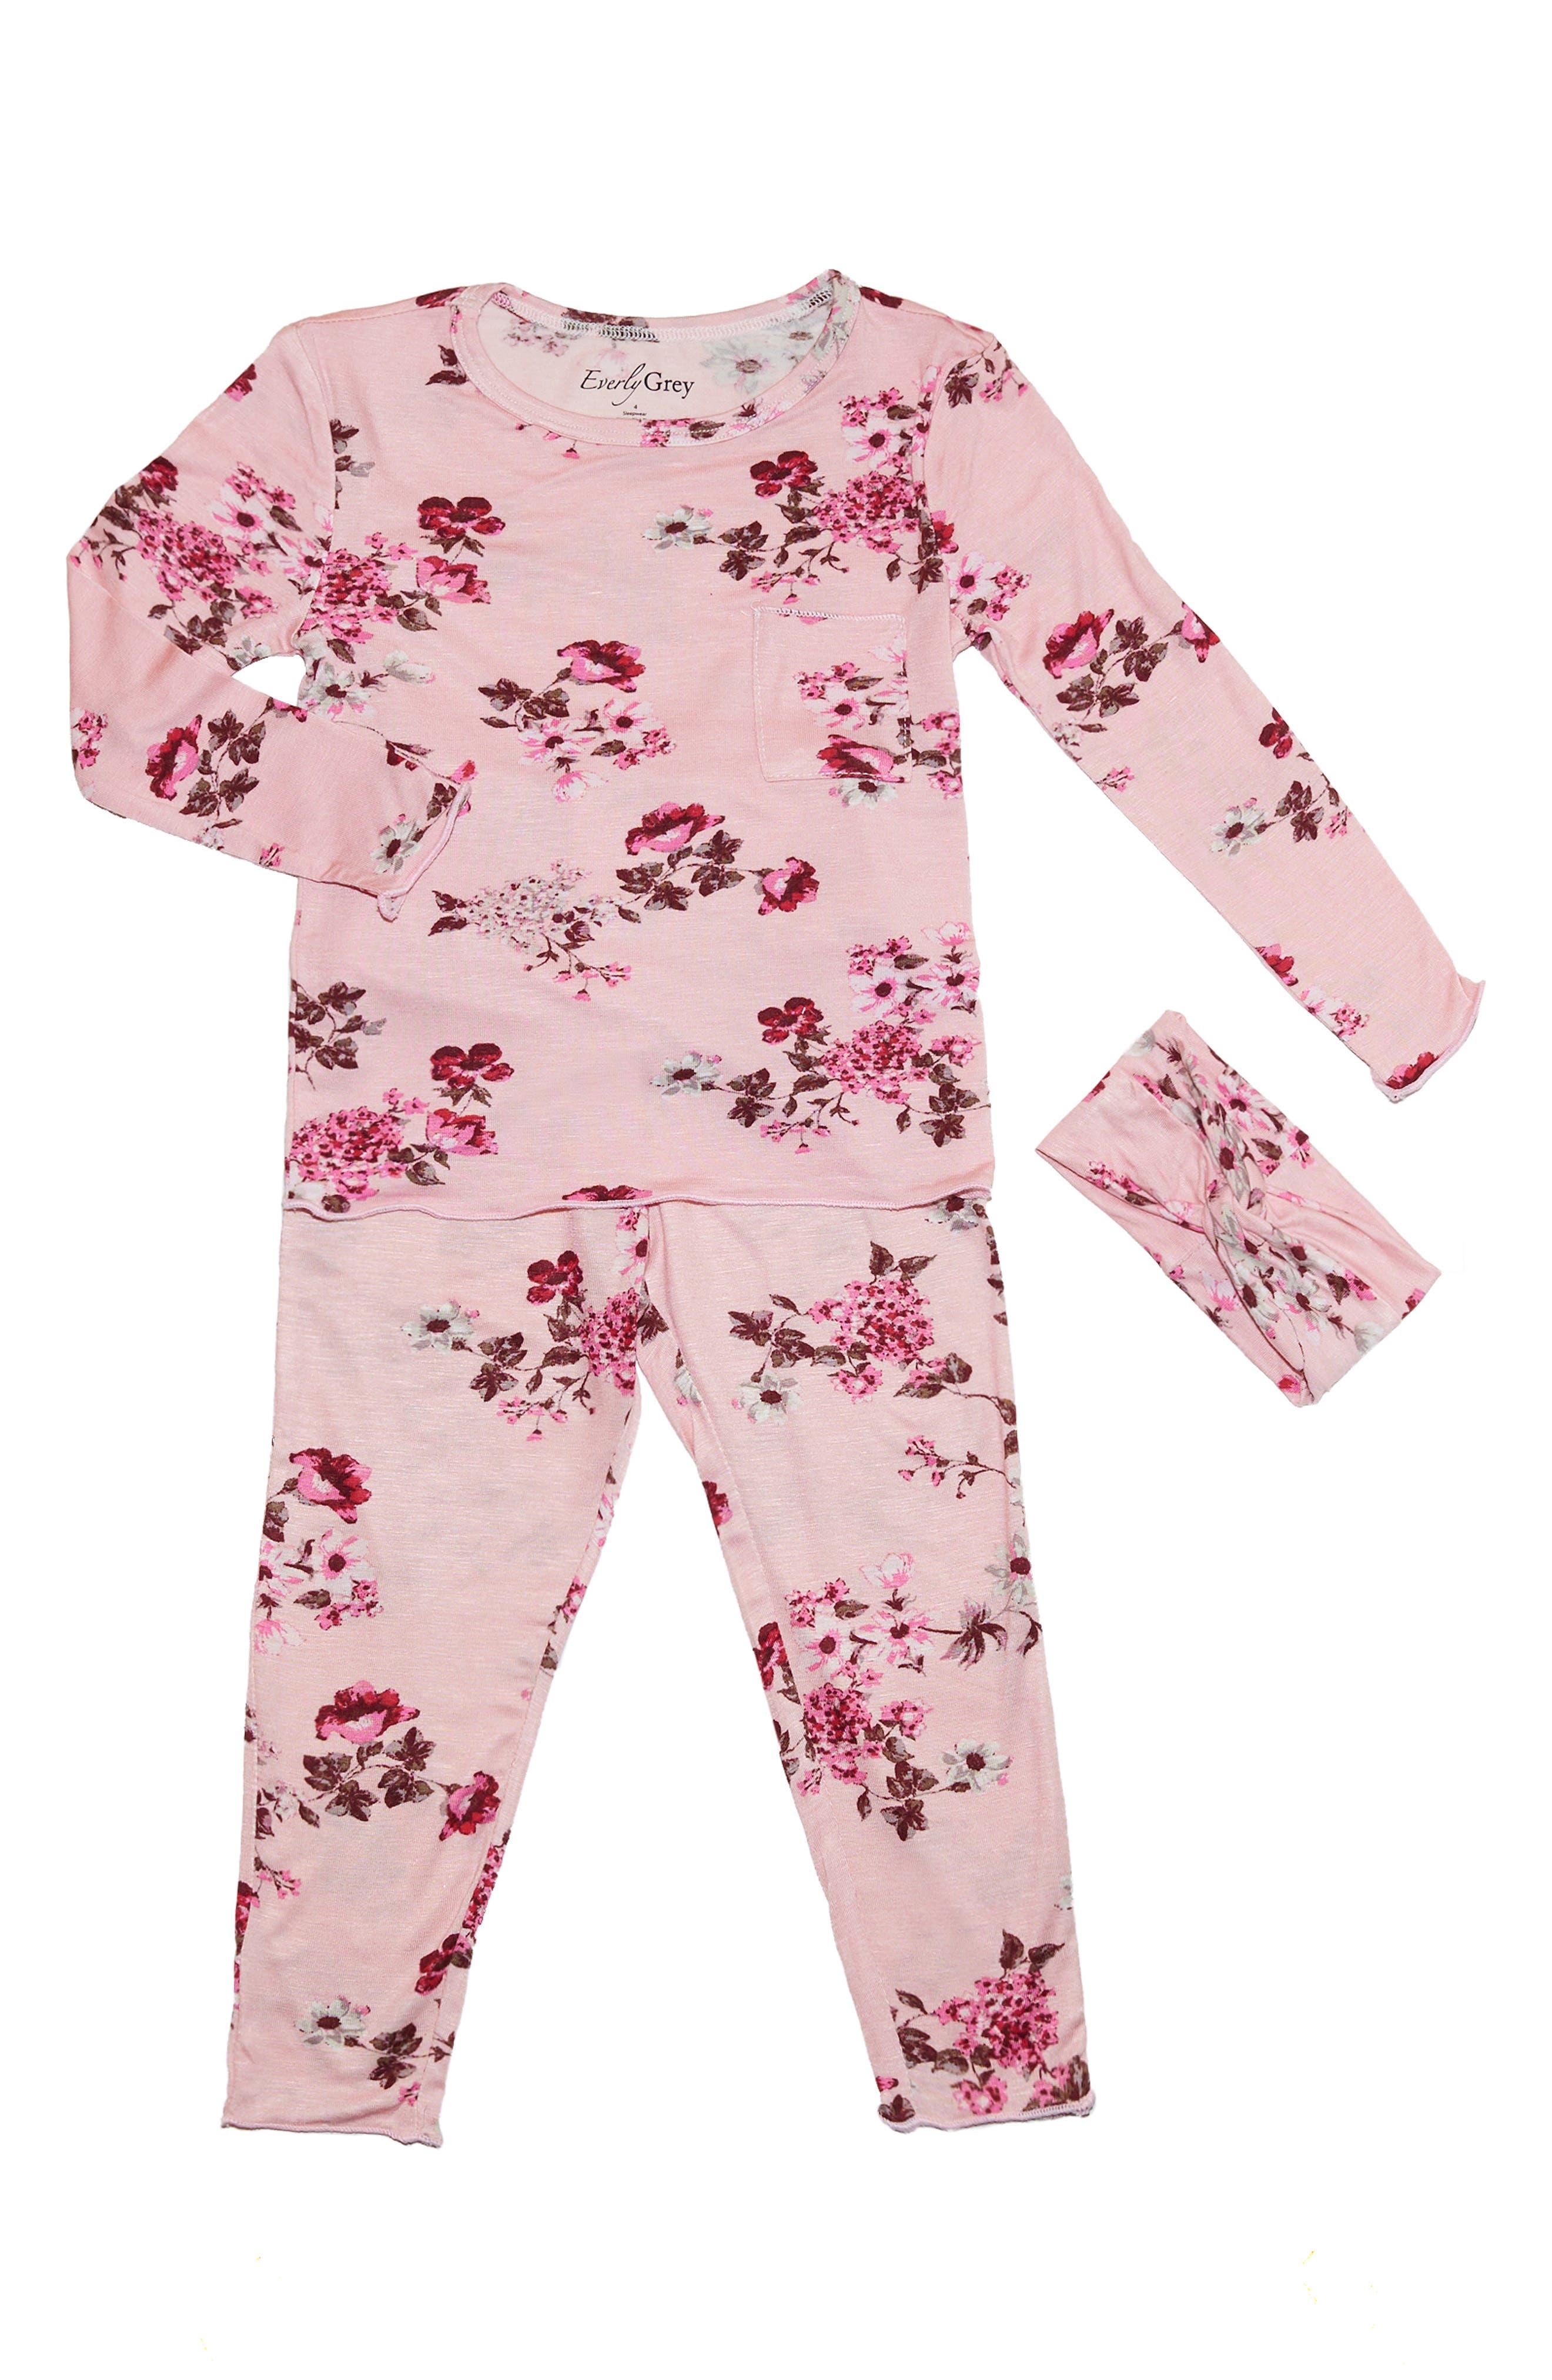 Baby Grey Charlie Fitted Two-Piece Pajamas \u0026 Head Wrap Set (Baby) Girl Sleepwear   Nordstrom